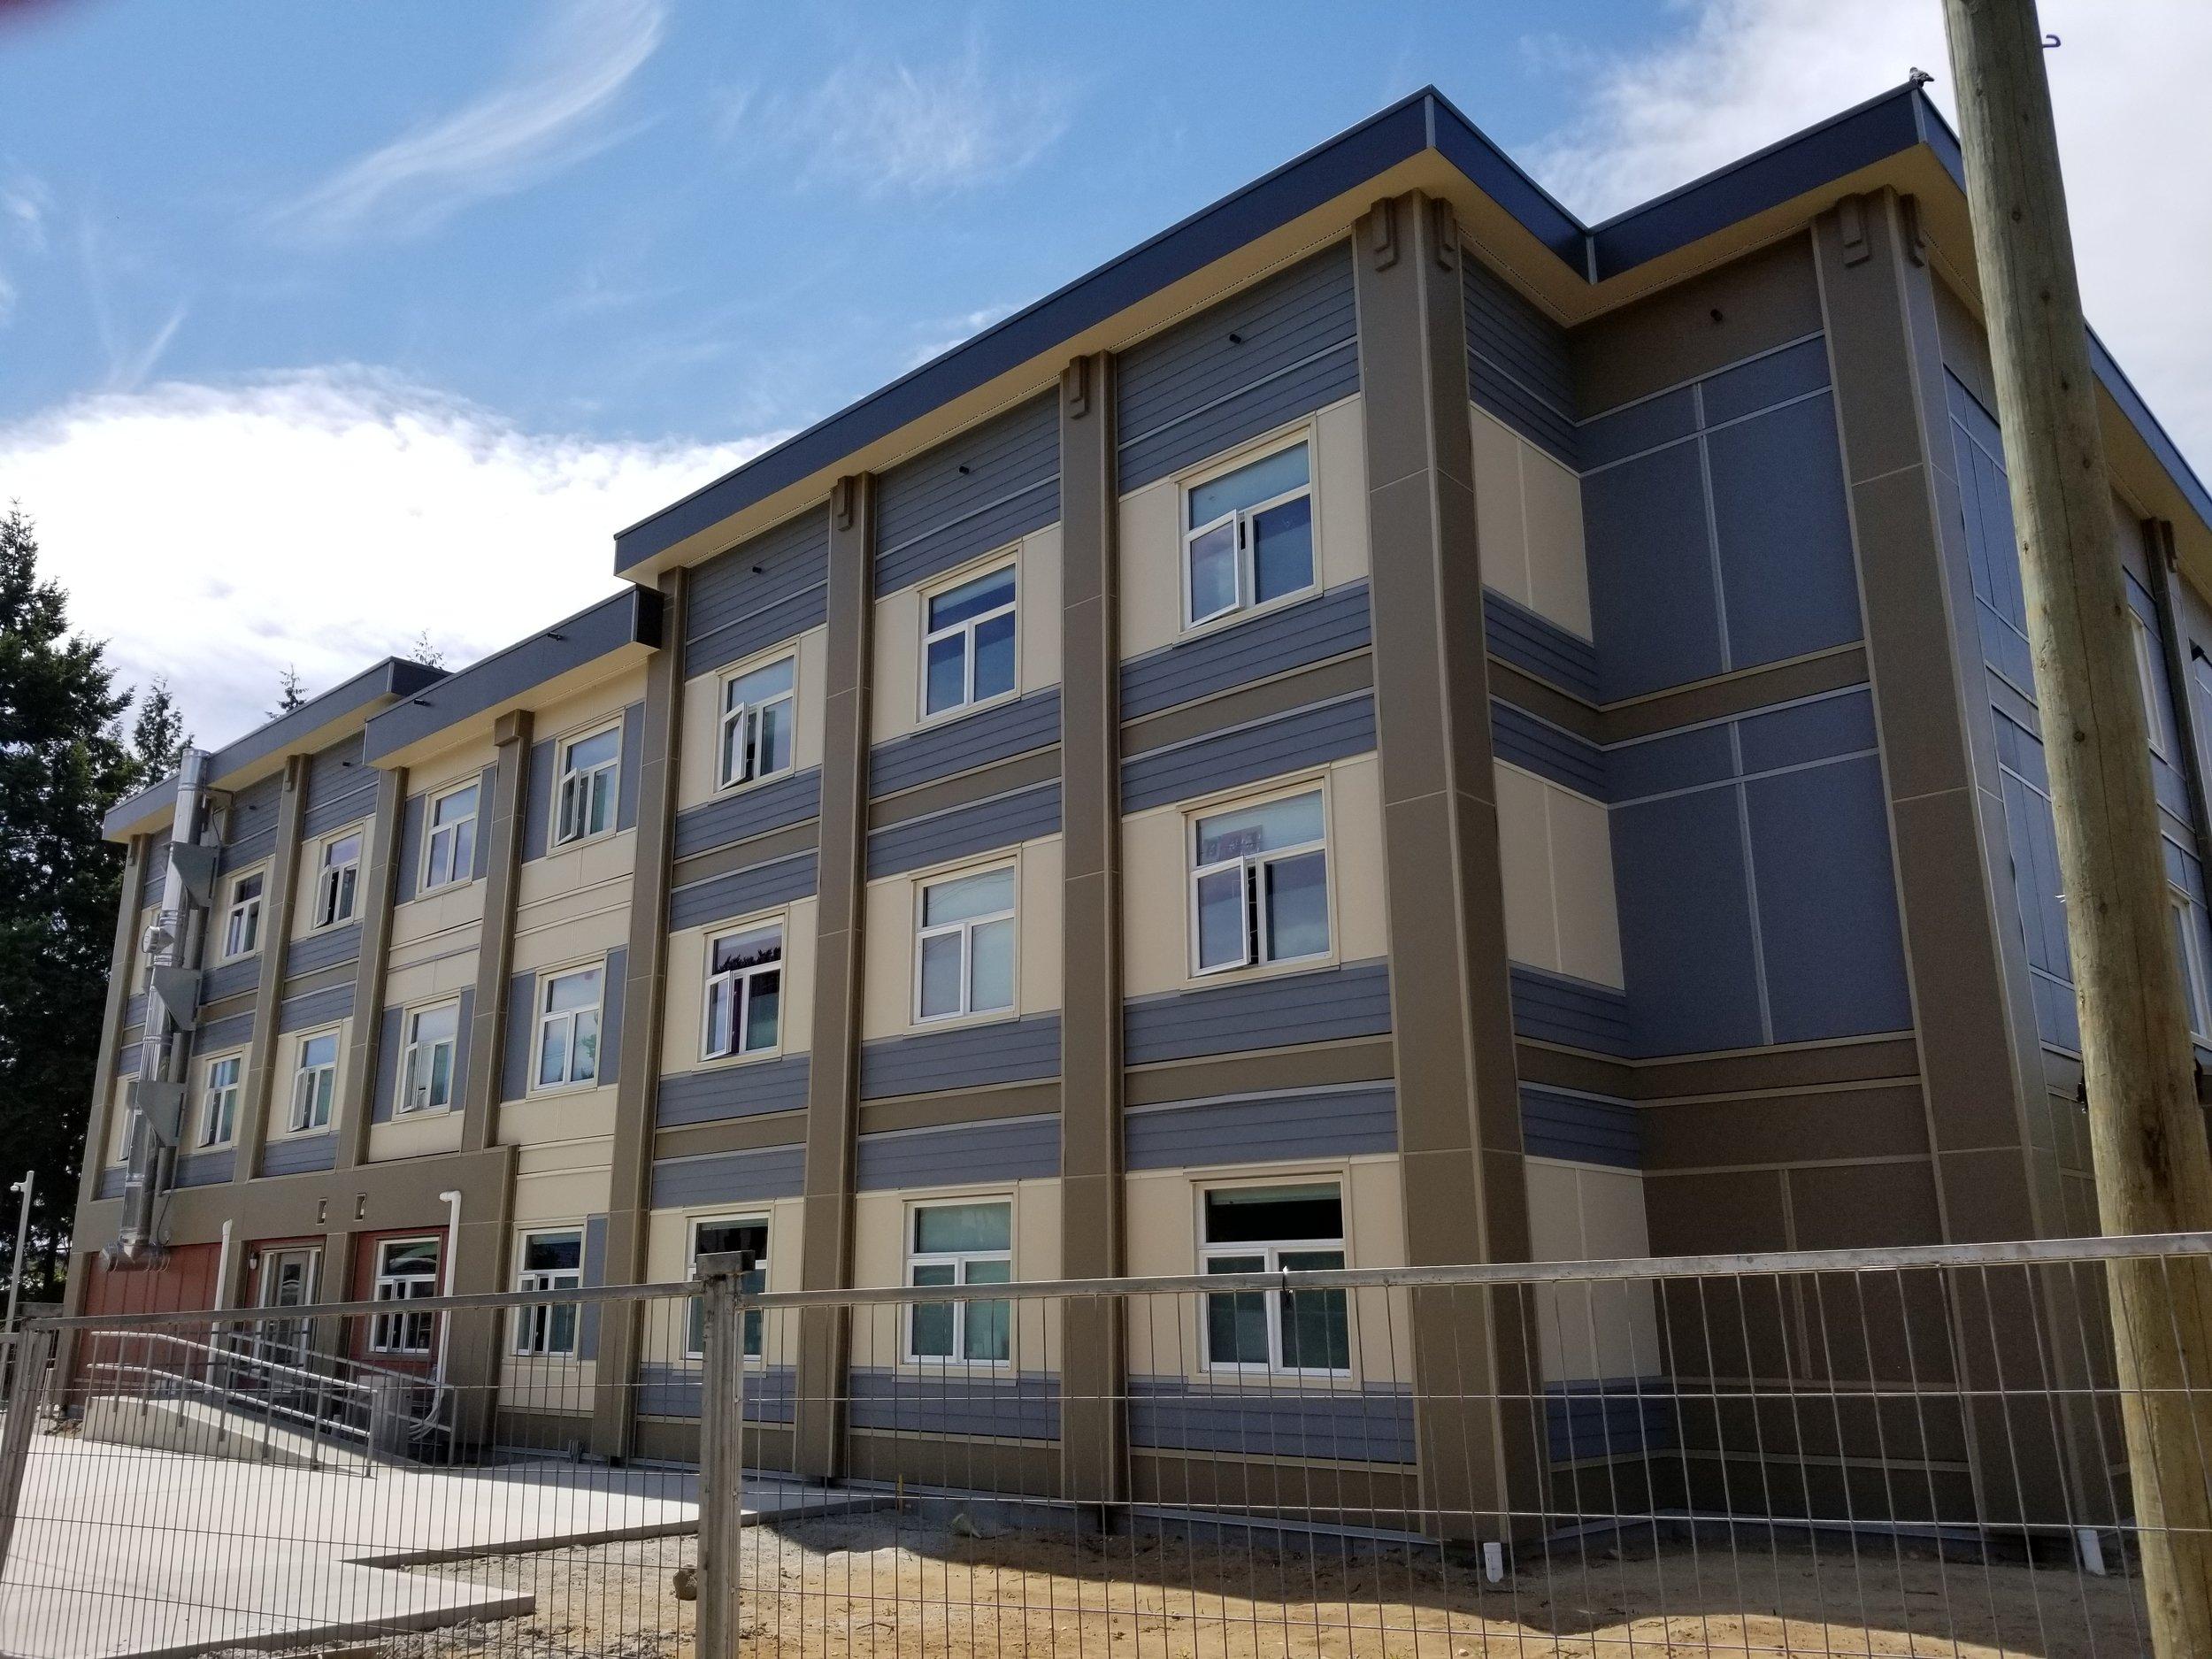 Sechelt's new Modular housing project built by    Spani Developments